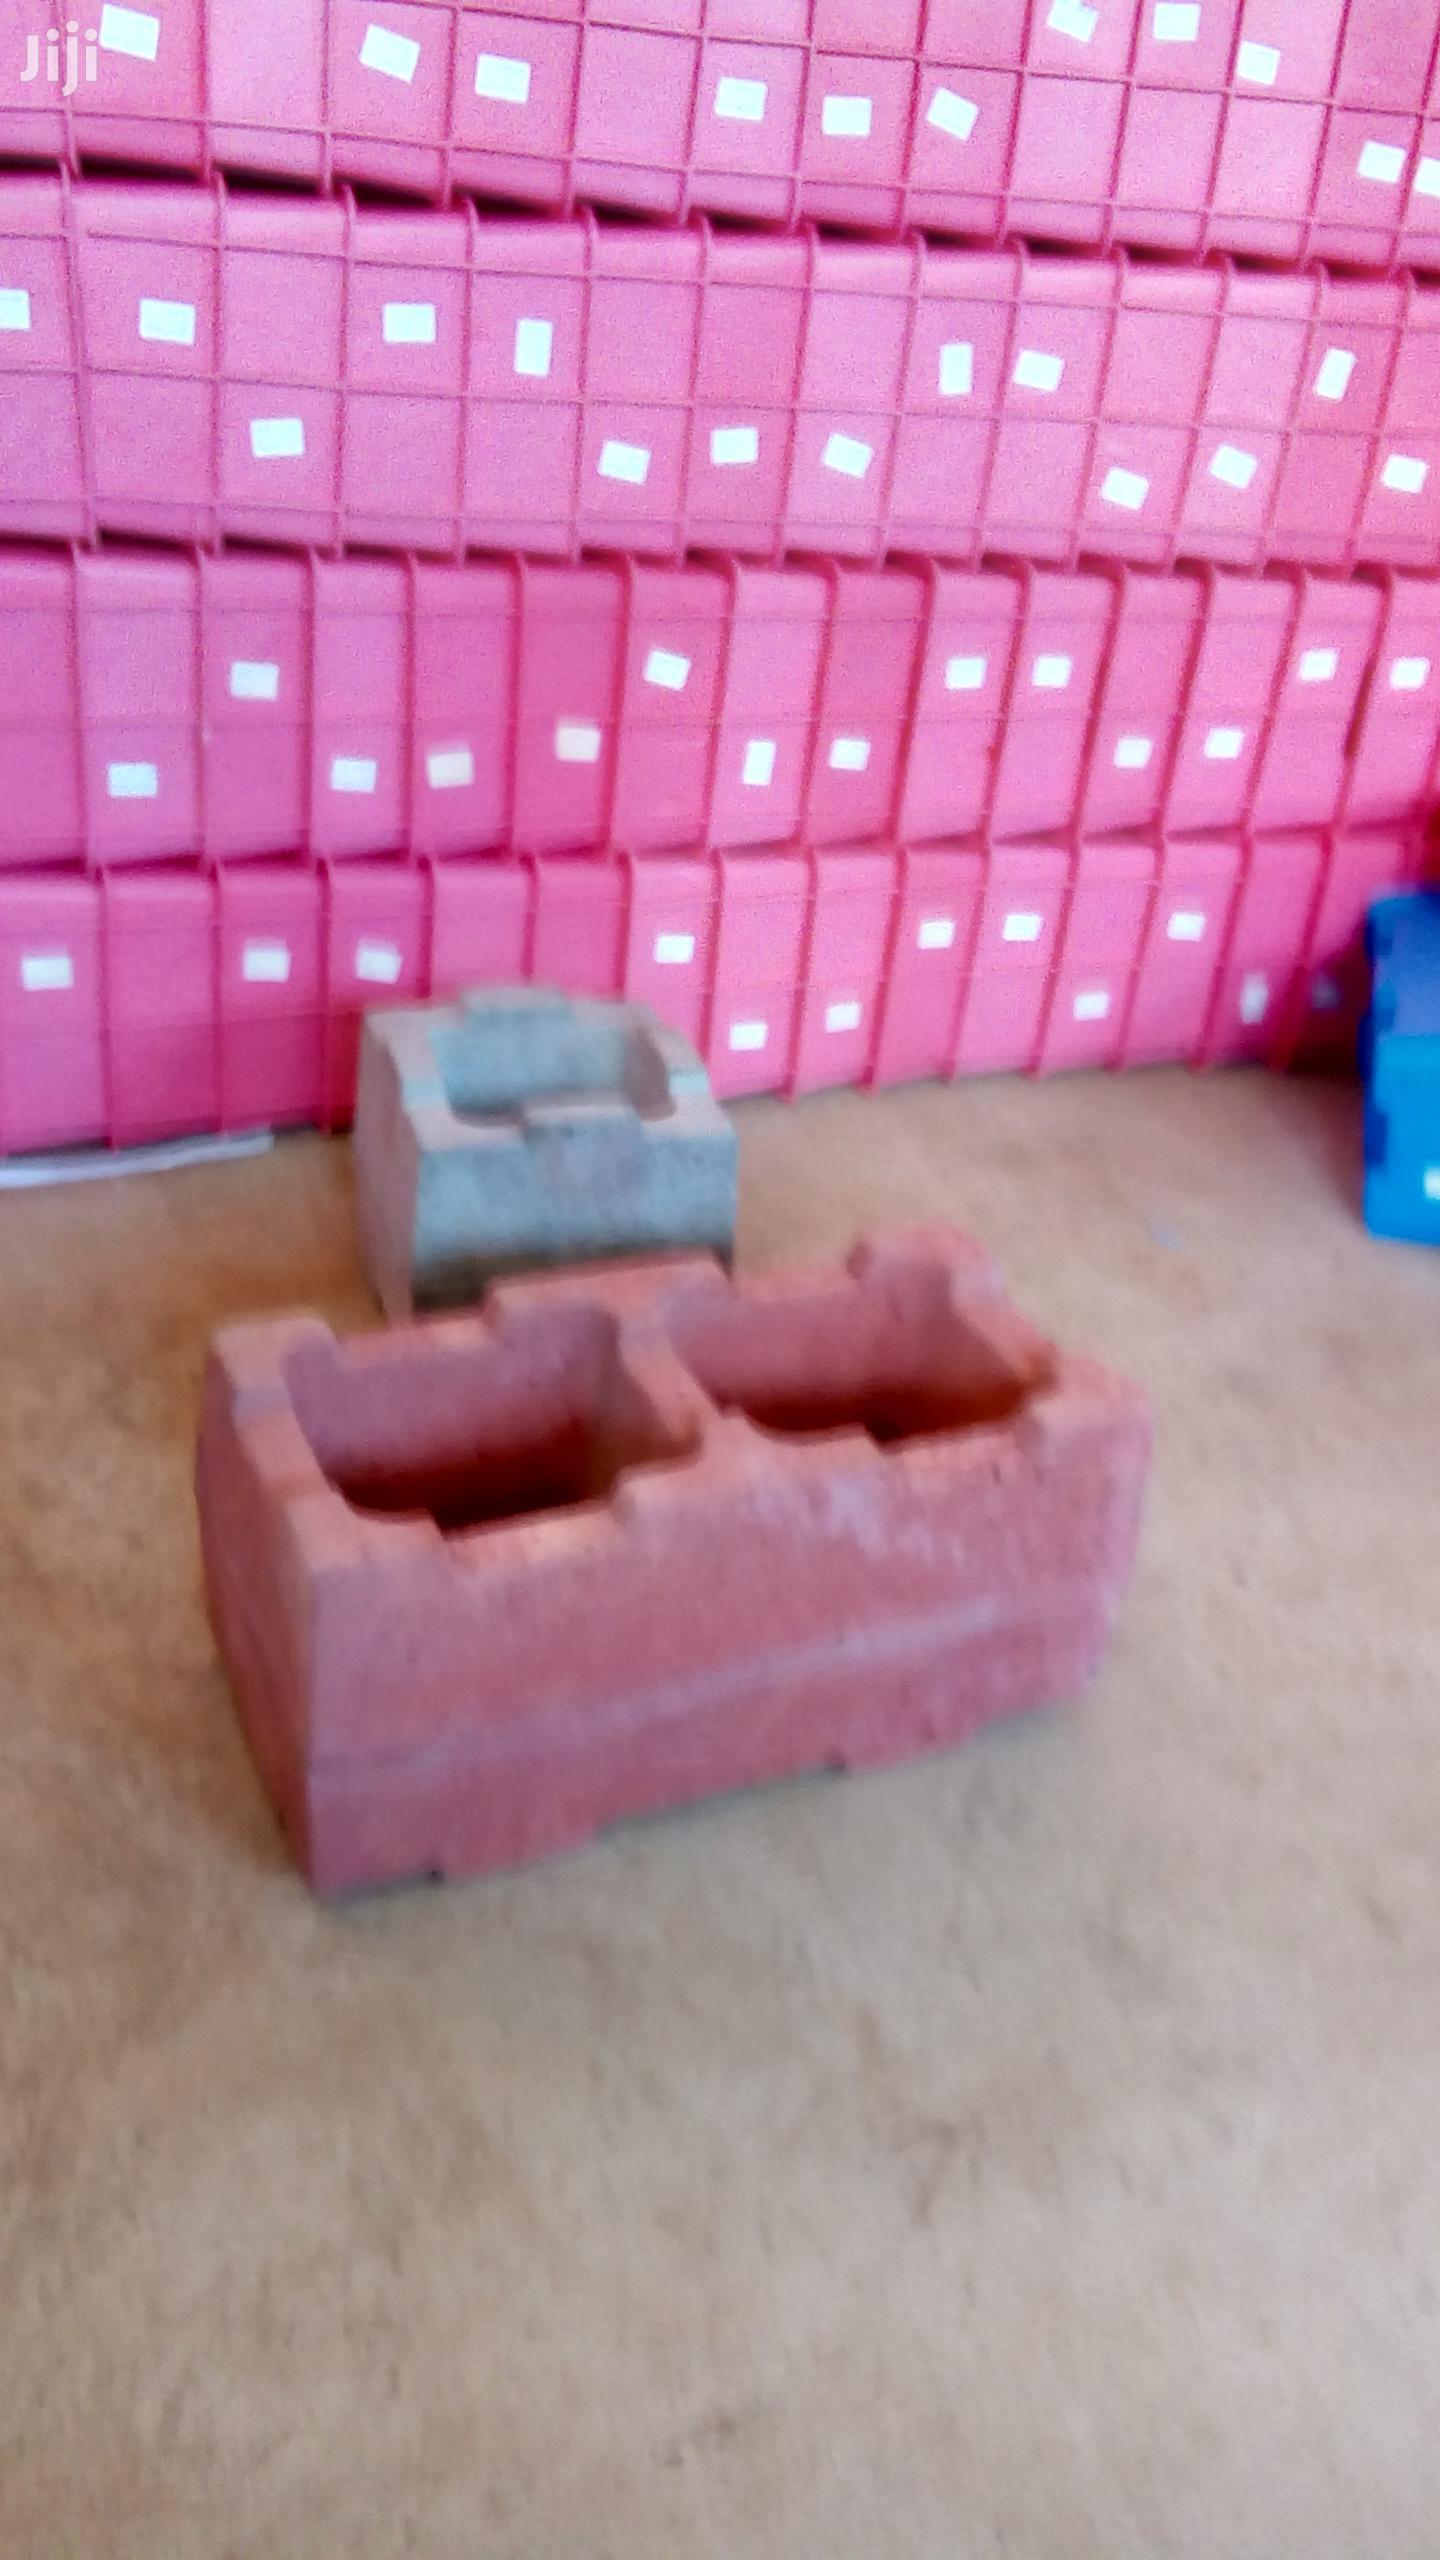 Lego Interlocking Block Moulds On Sale